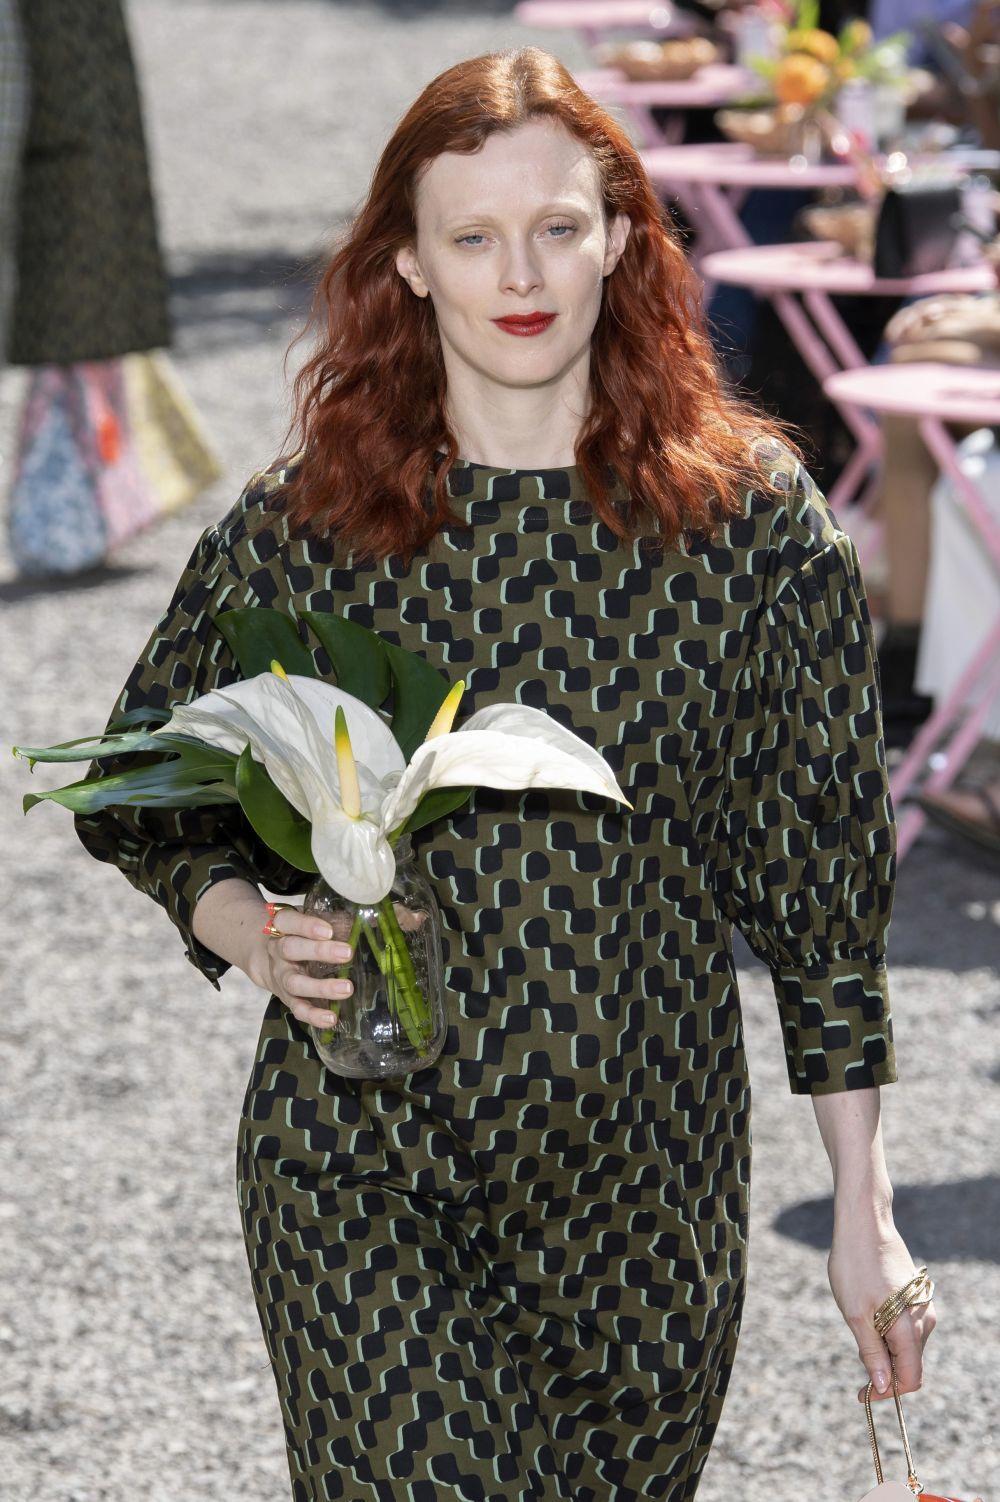 La modelo Karen Elson en el desfile de Kate Spade